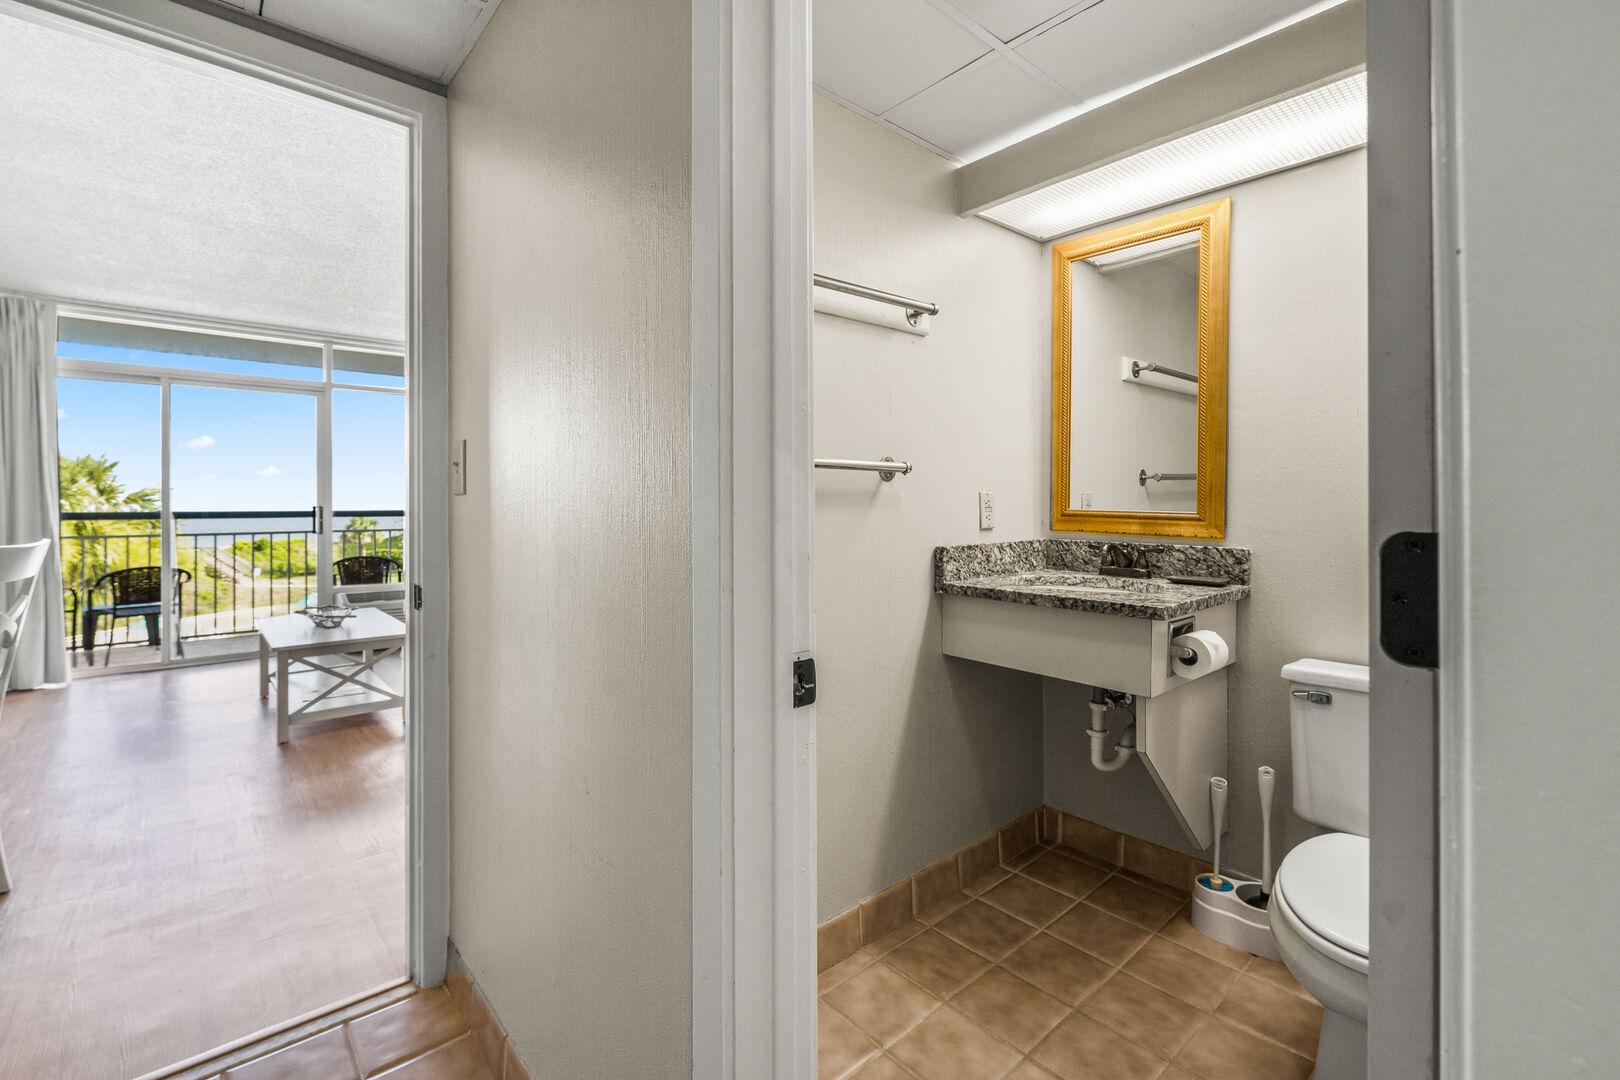 Bathroom (Sink/Toilet on Living Area Side)